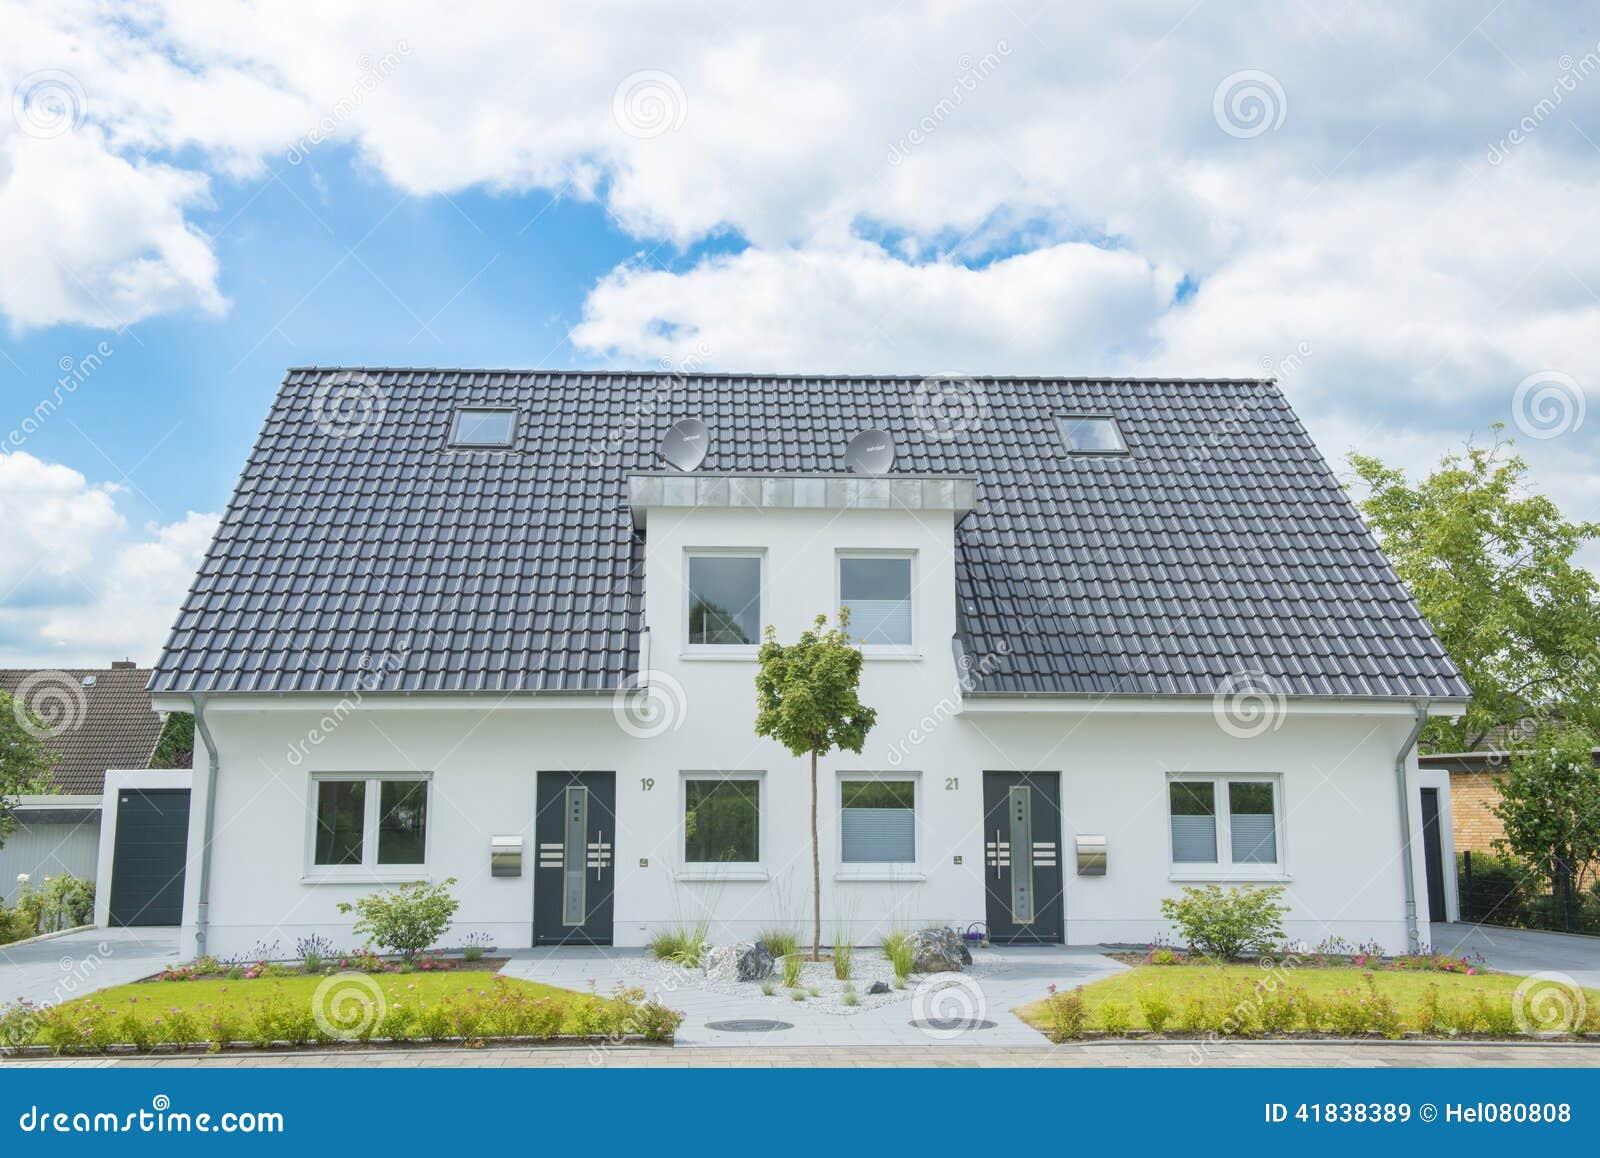 duplex house stock photos download 882 images